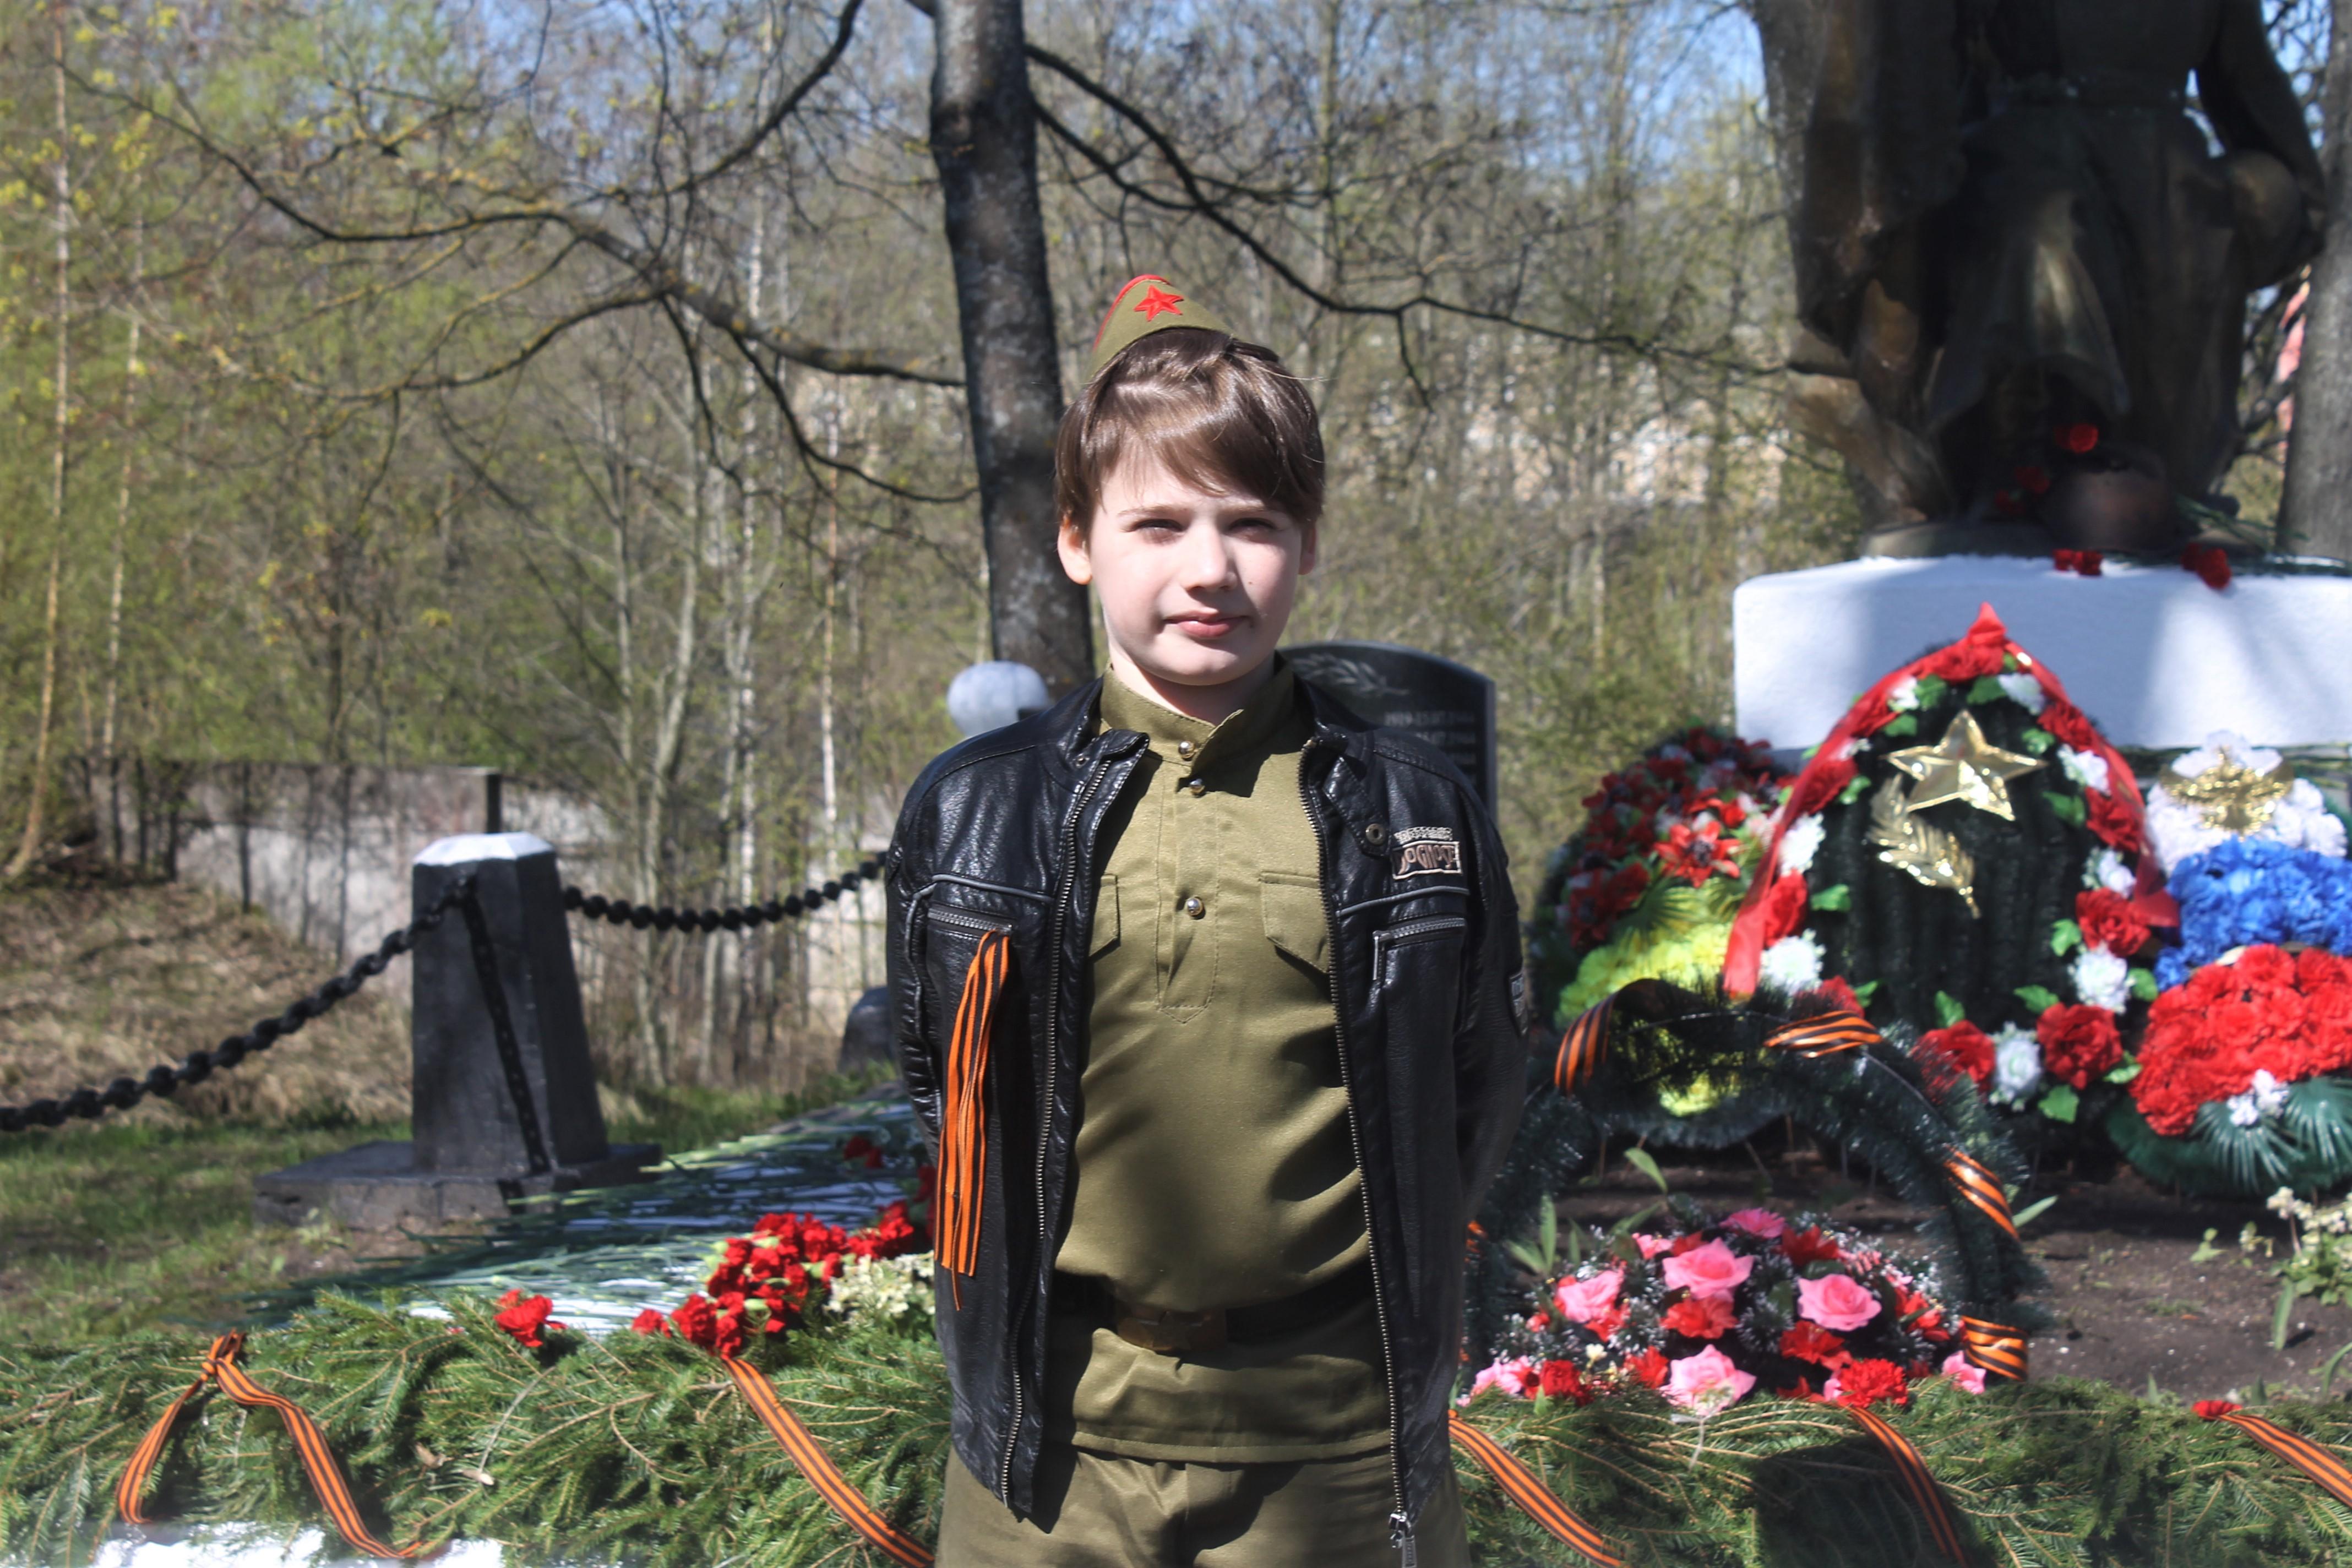 Юный участник мотопробега Артём Дмитриев